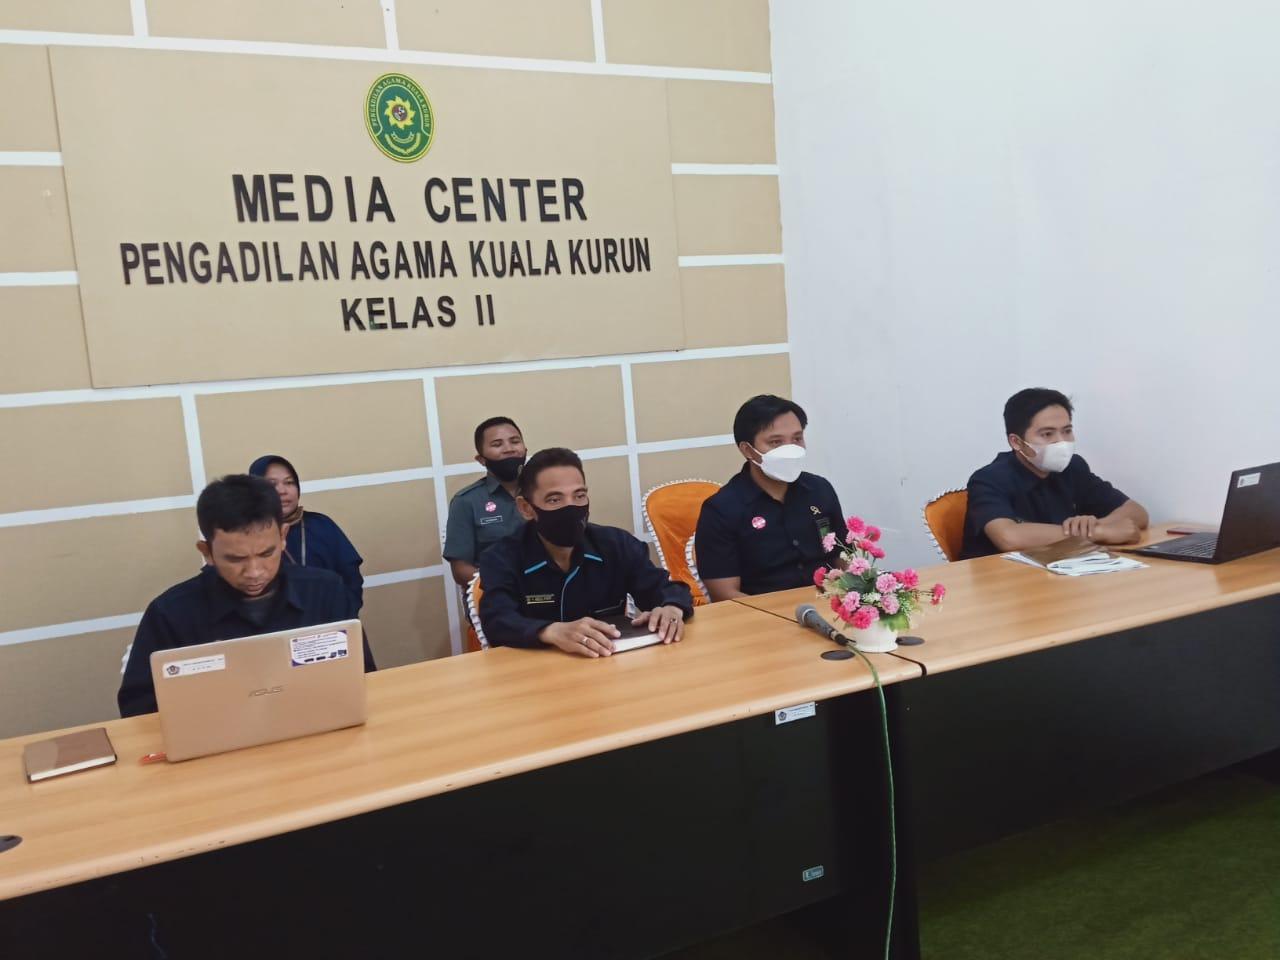 Pengadilan Agama Kuala Kurun Kelas II Ikuti Kegiatan Entry Meeting Desk Evaluation PMPZI Menuju WBK | (14/6)